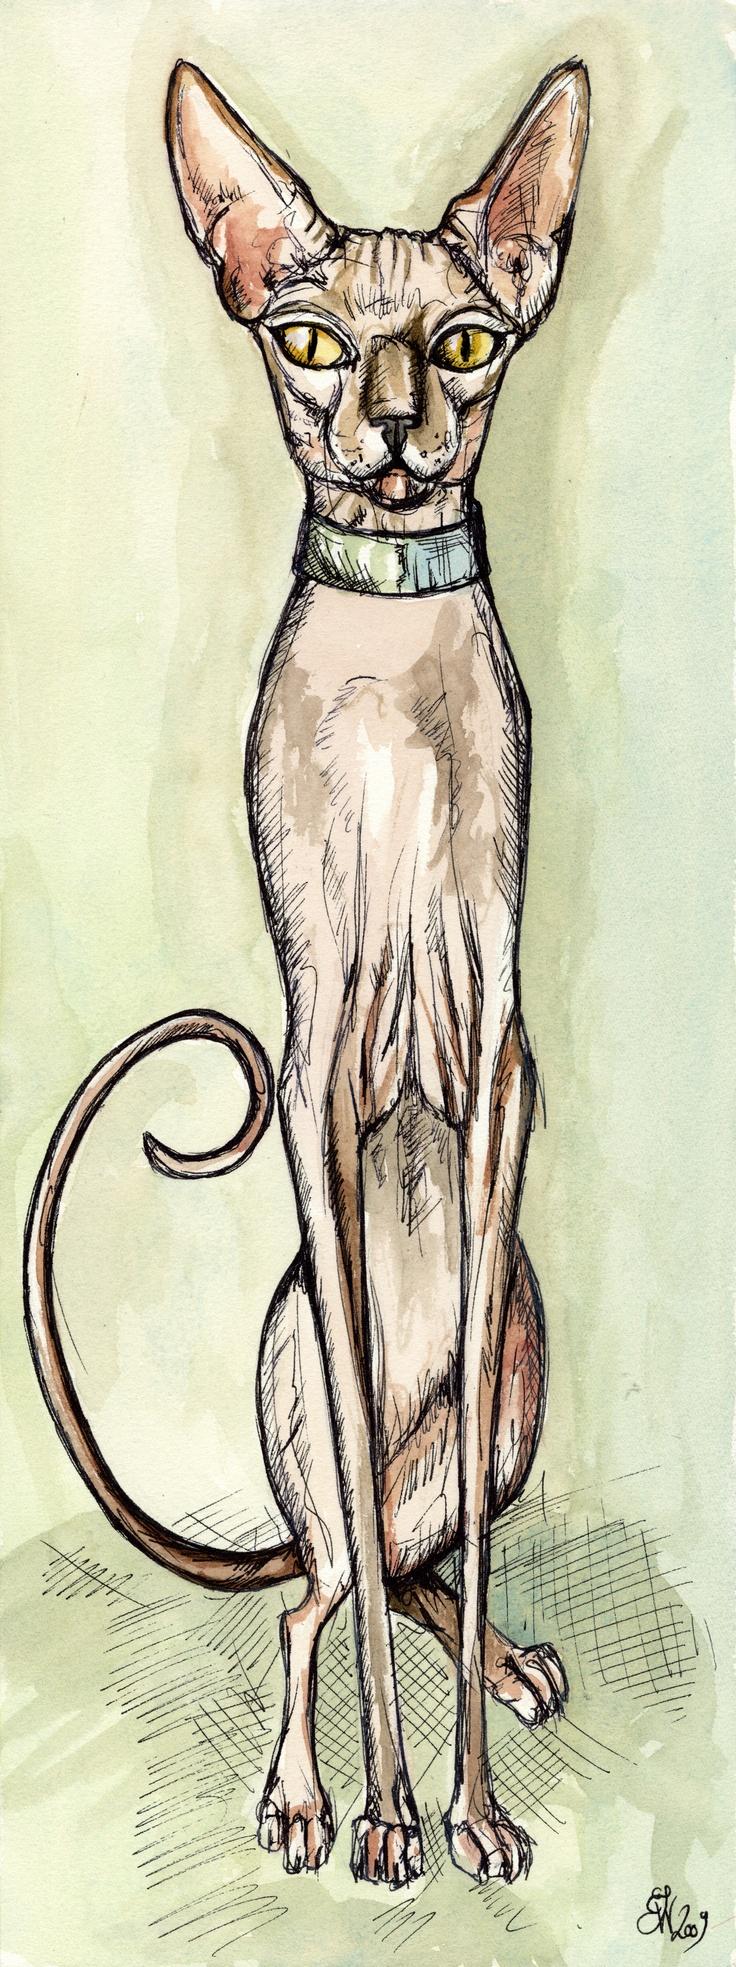 Sphynx Cat - A Little Curiosity- by Elle J. Wilson